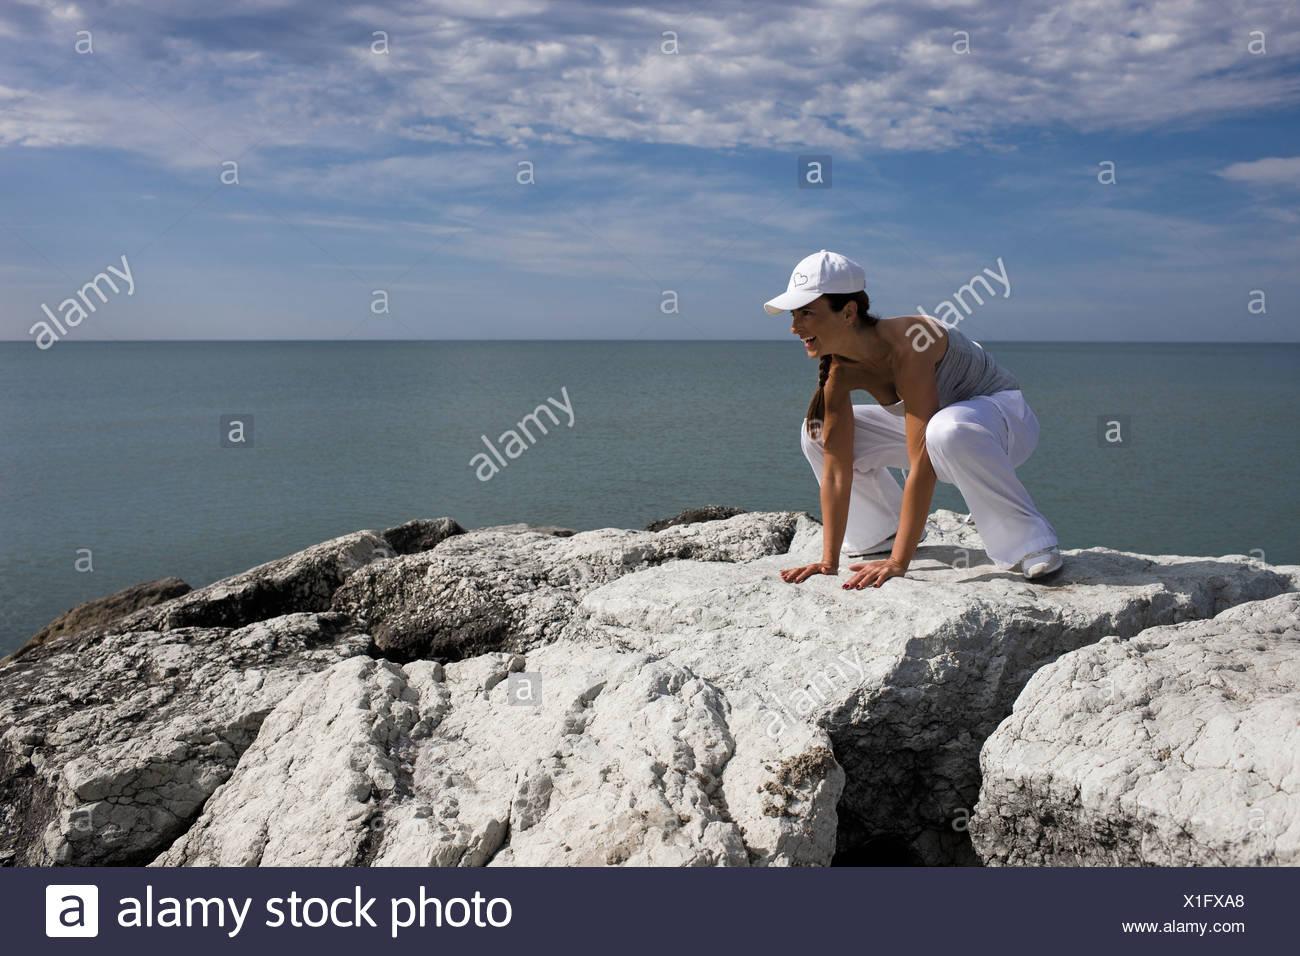 Woman hunkering down on rocks - Stock Image